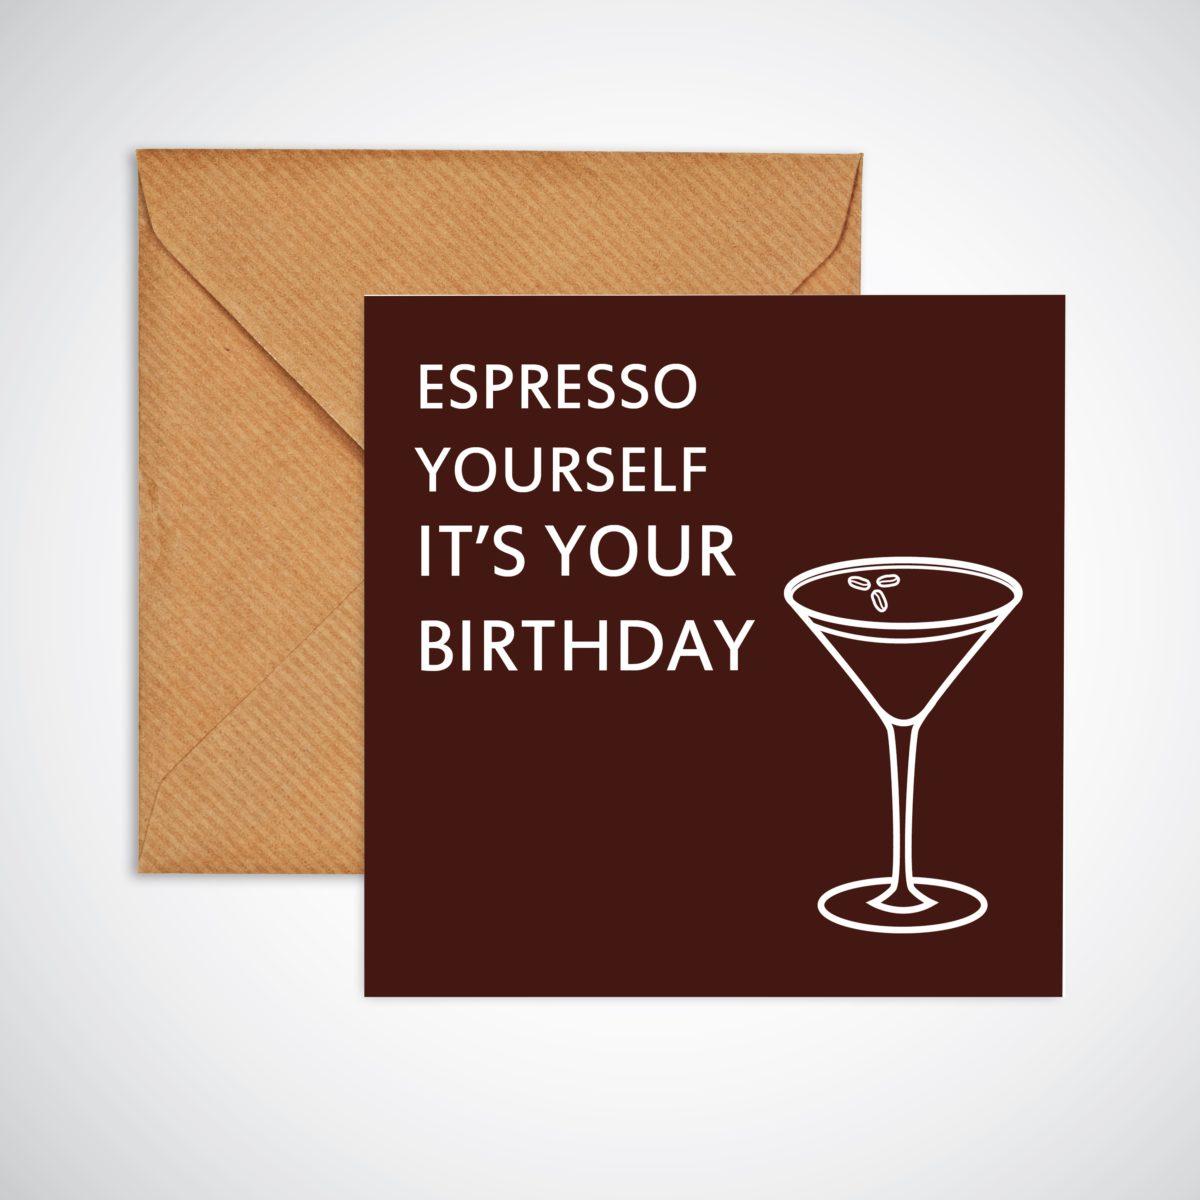 Espresso Yourself Birthday Card